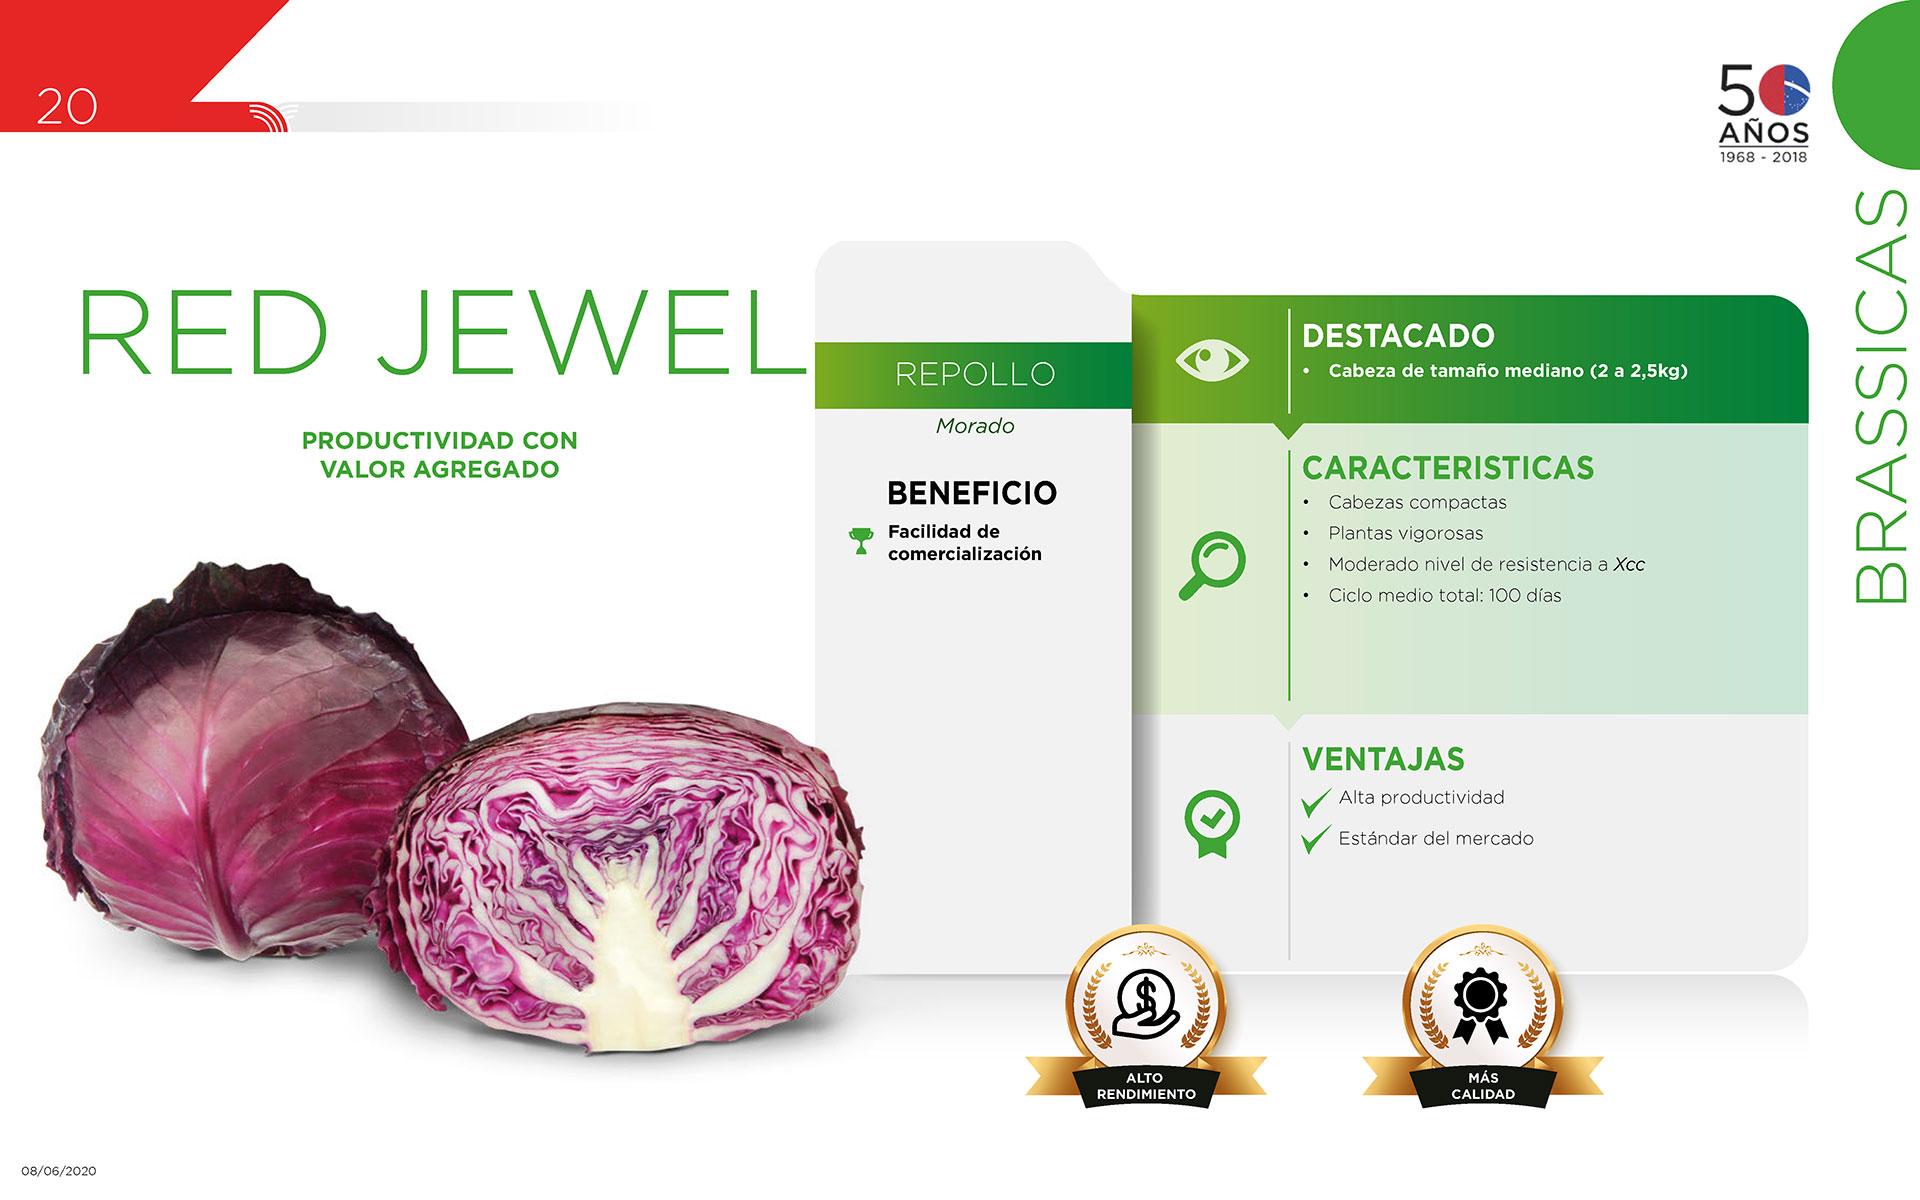 Red Jewel - Brassicas